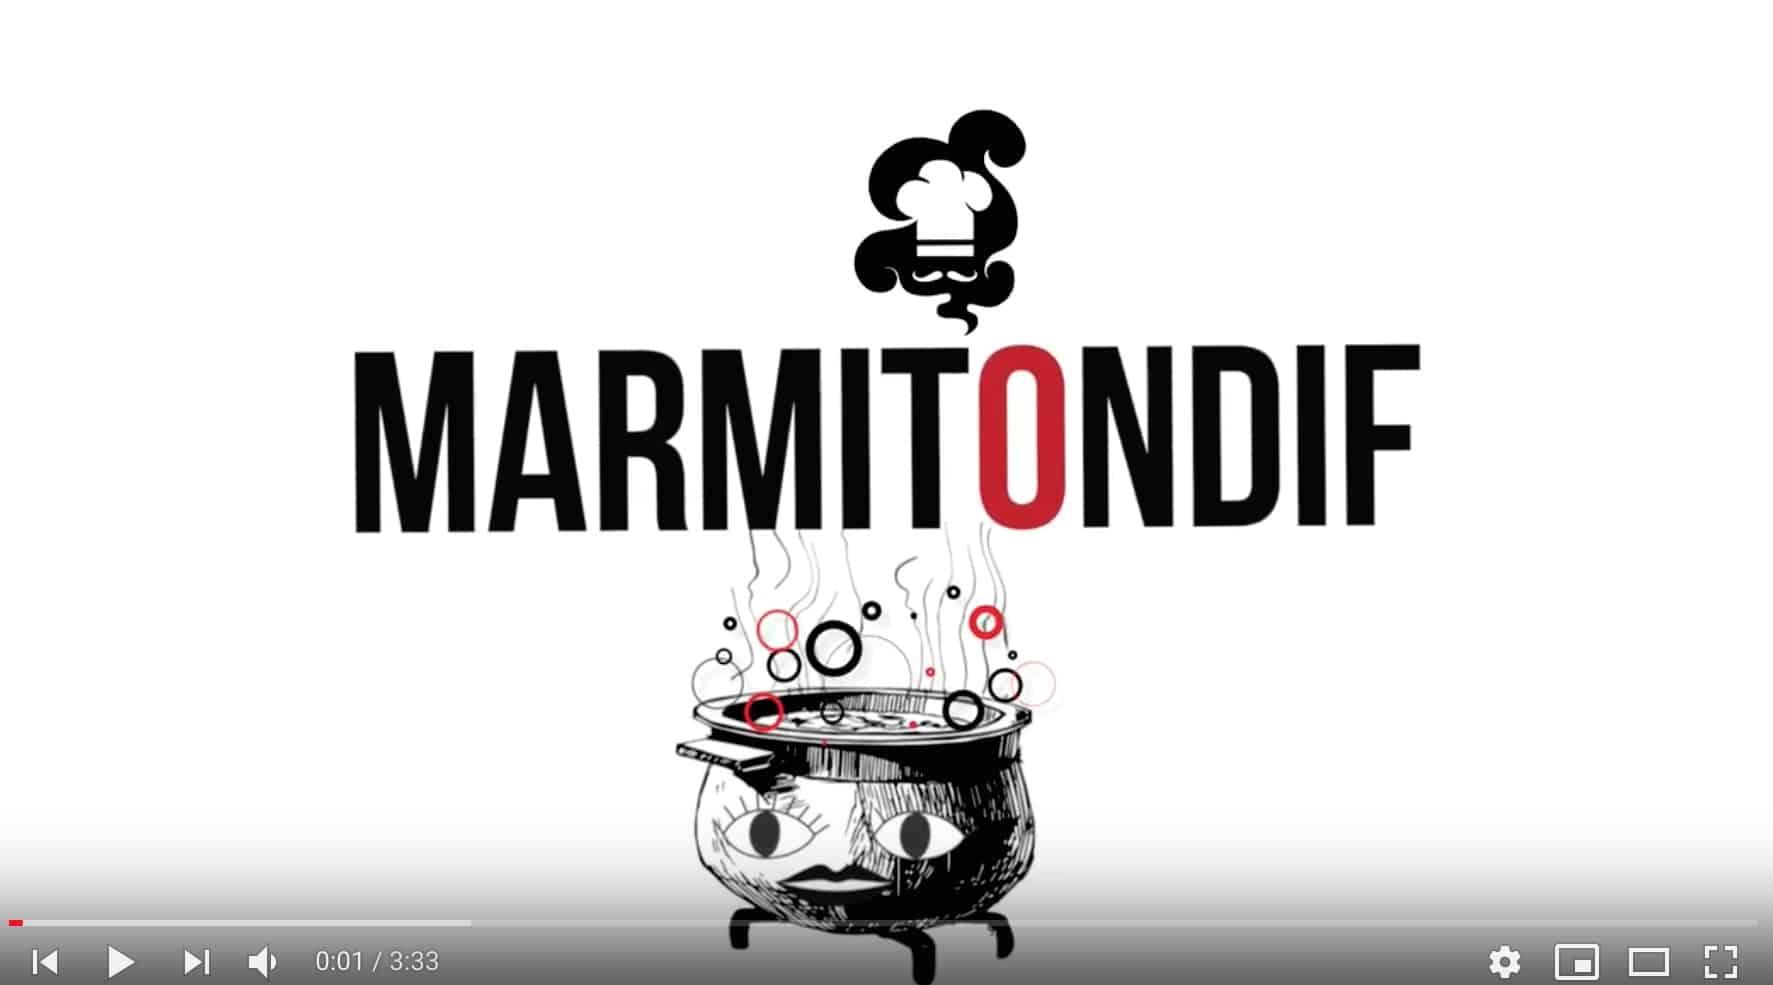 MarmitOndif